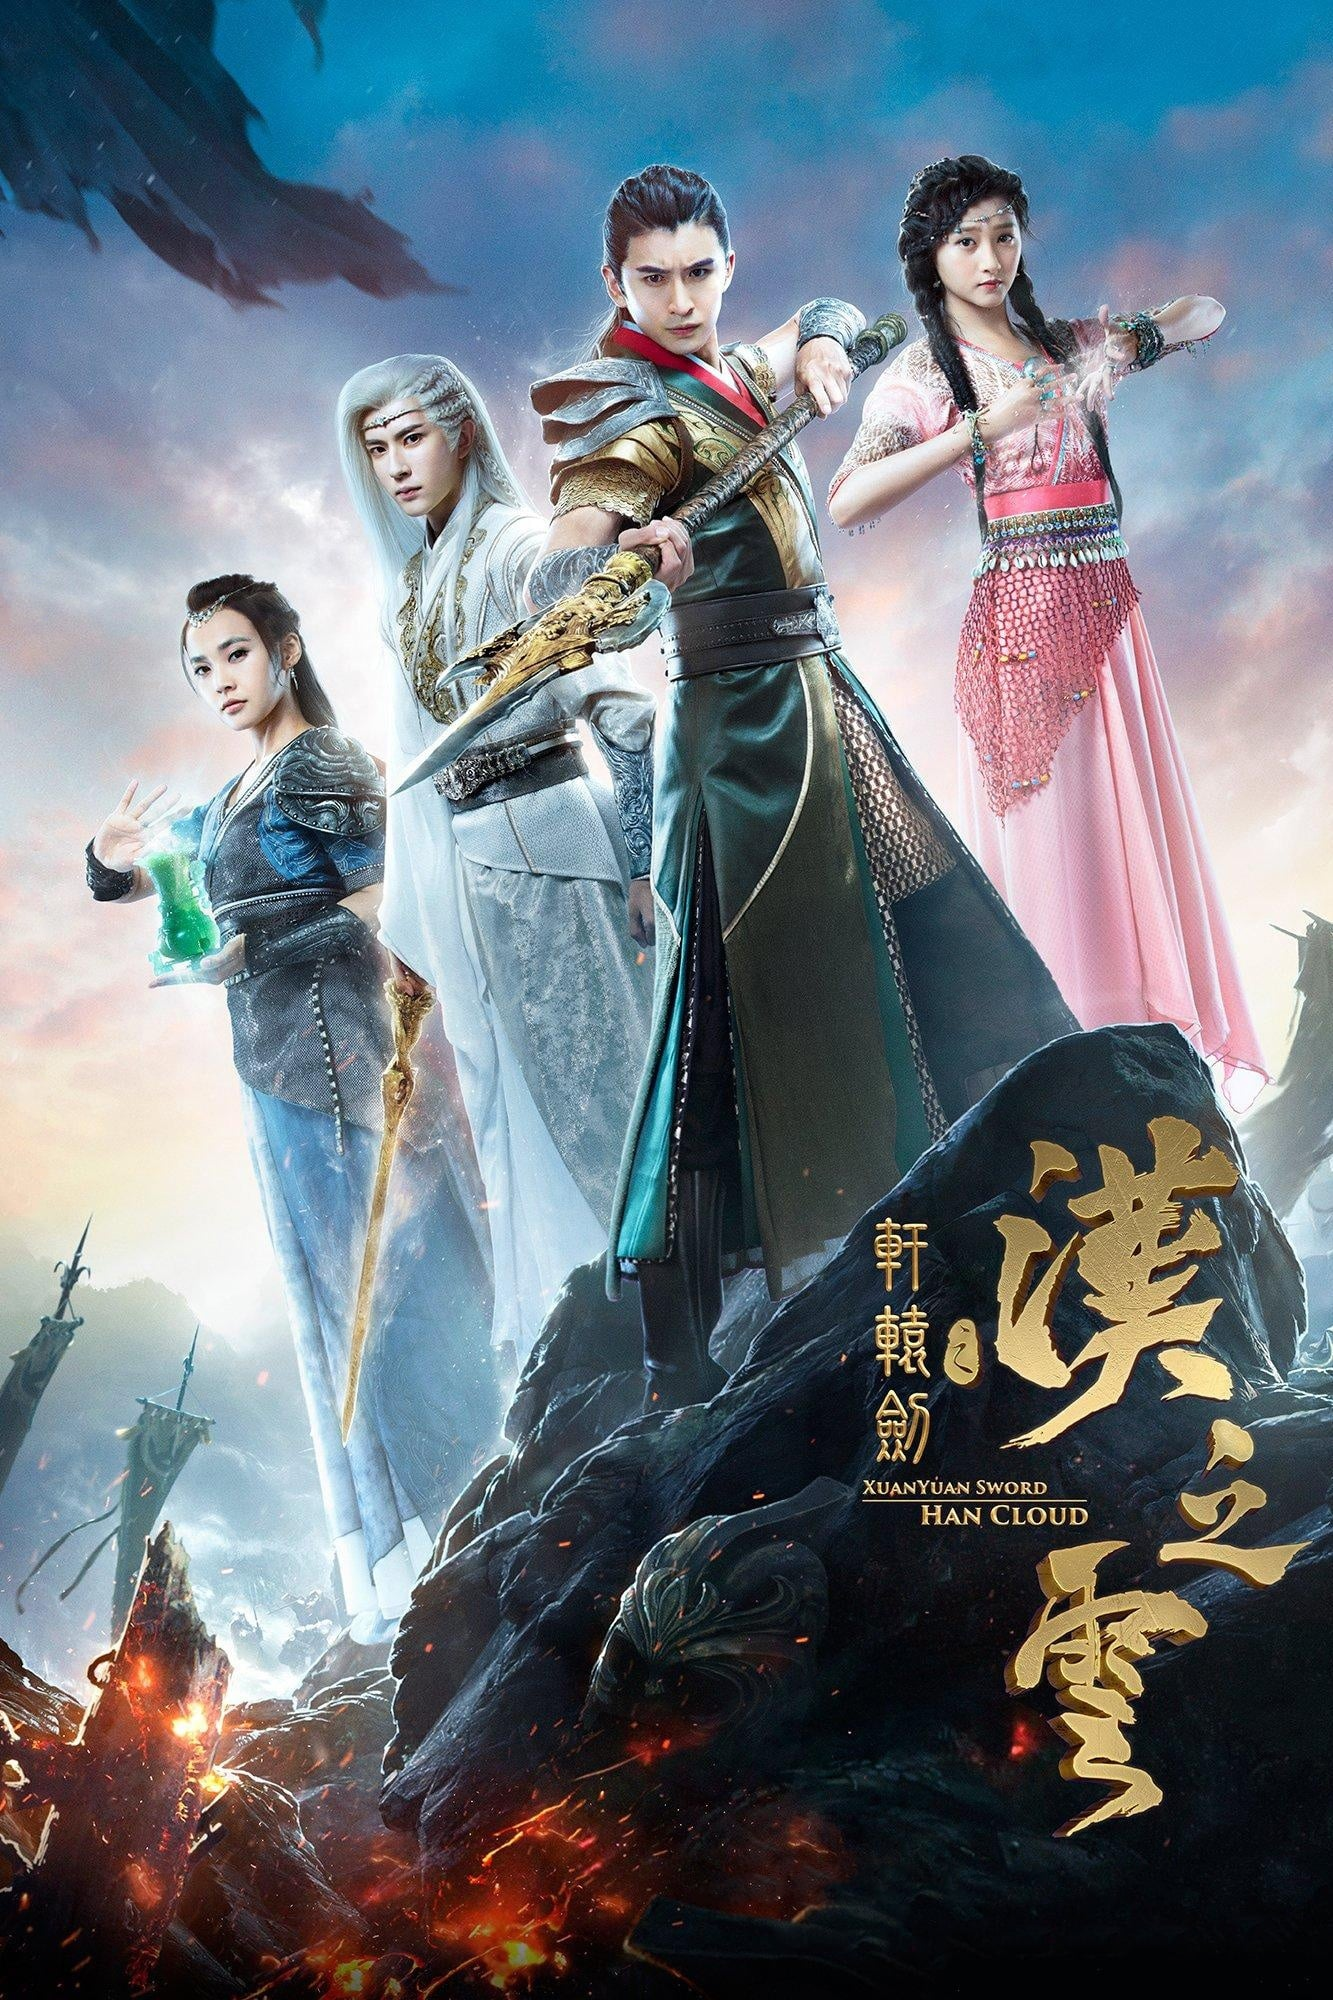 Xuan-Yuan Sword: Han Cloud (2017)